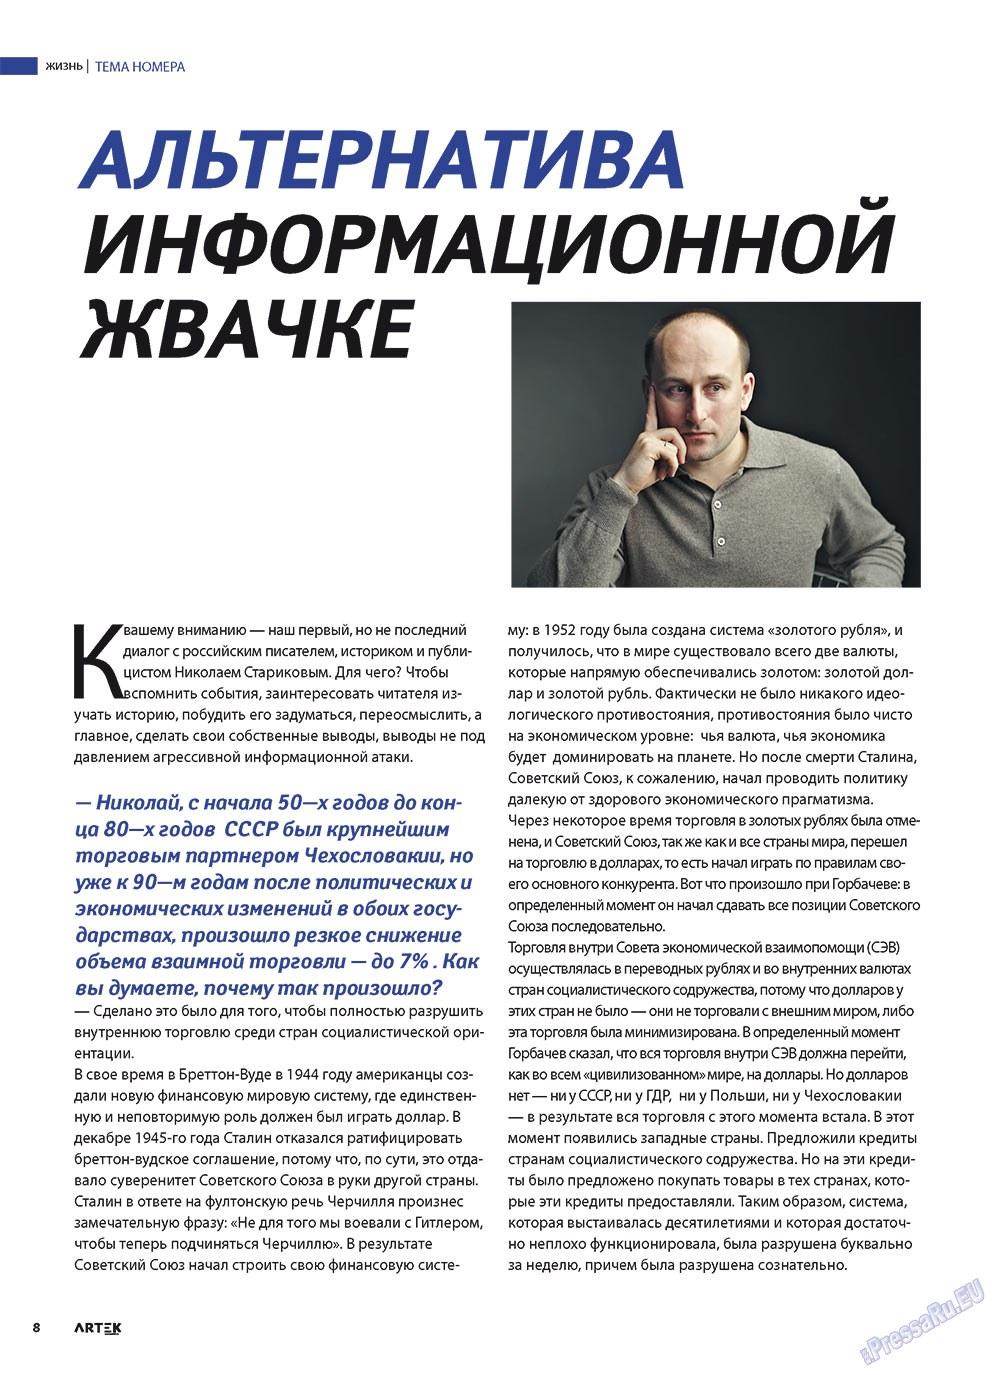 Артек (журнал). 2011 год, номер 1, стр. 10